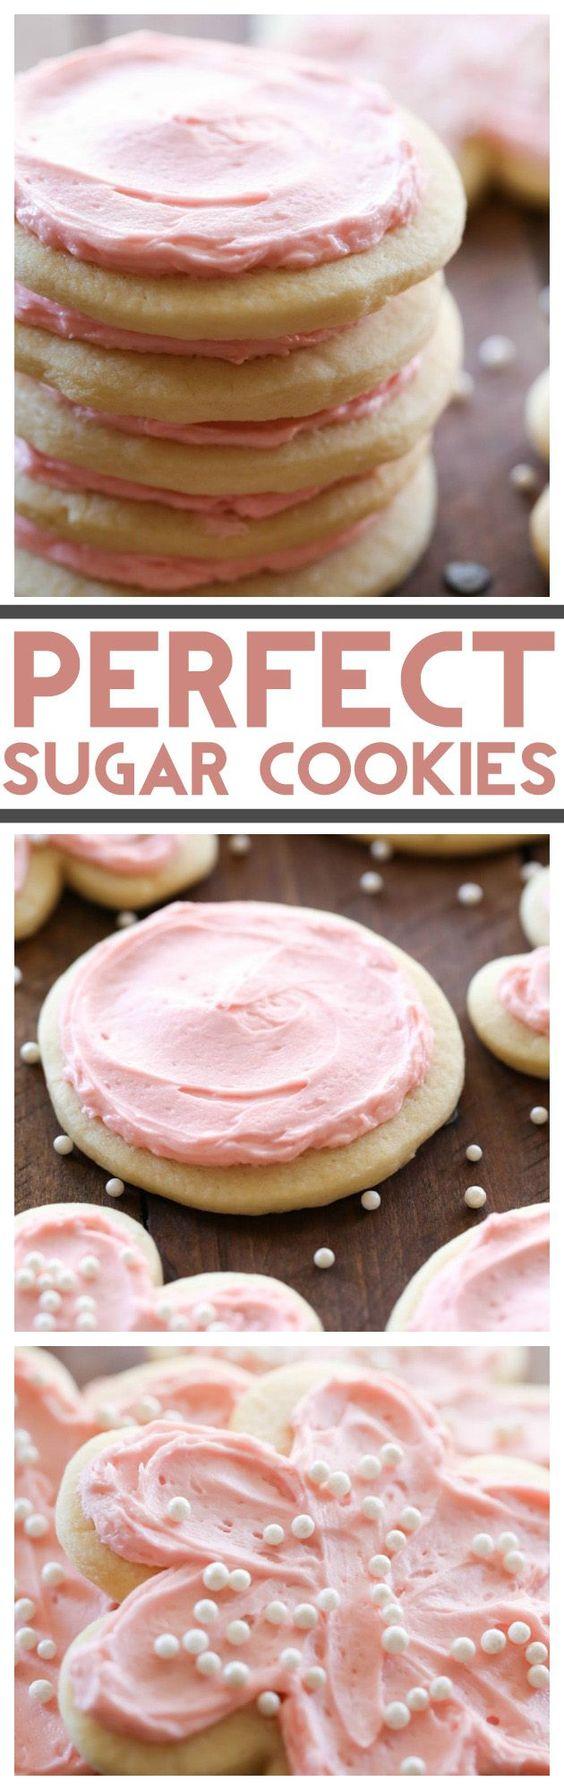 Wonderful cookies recipes